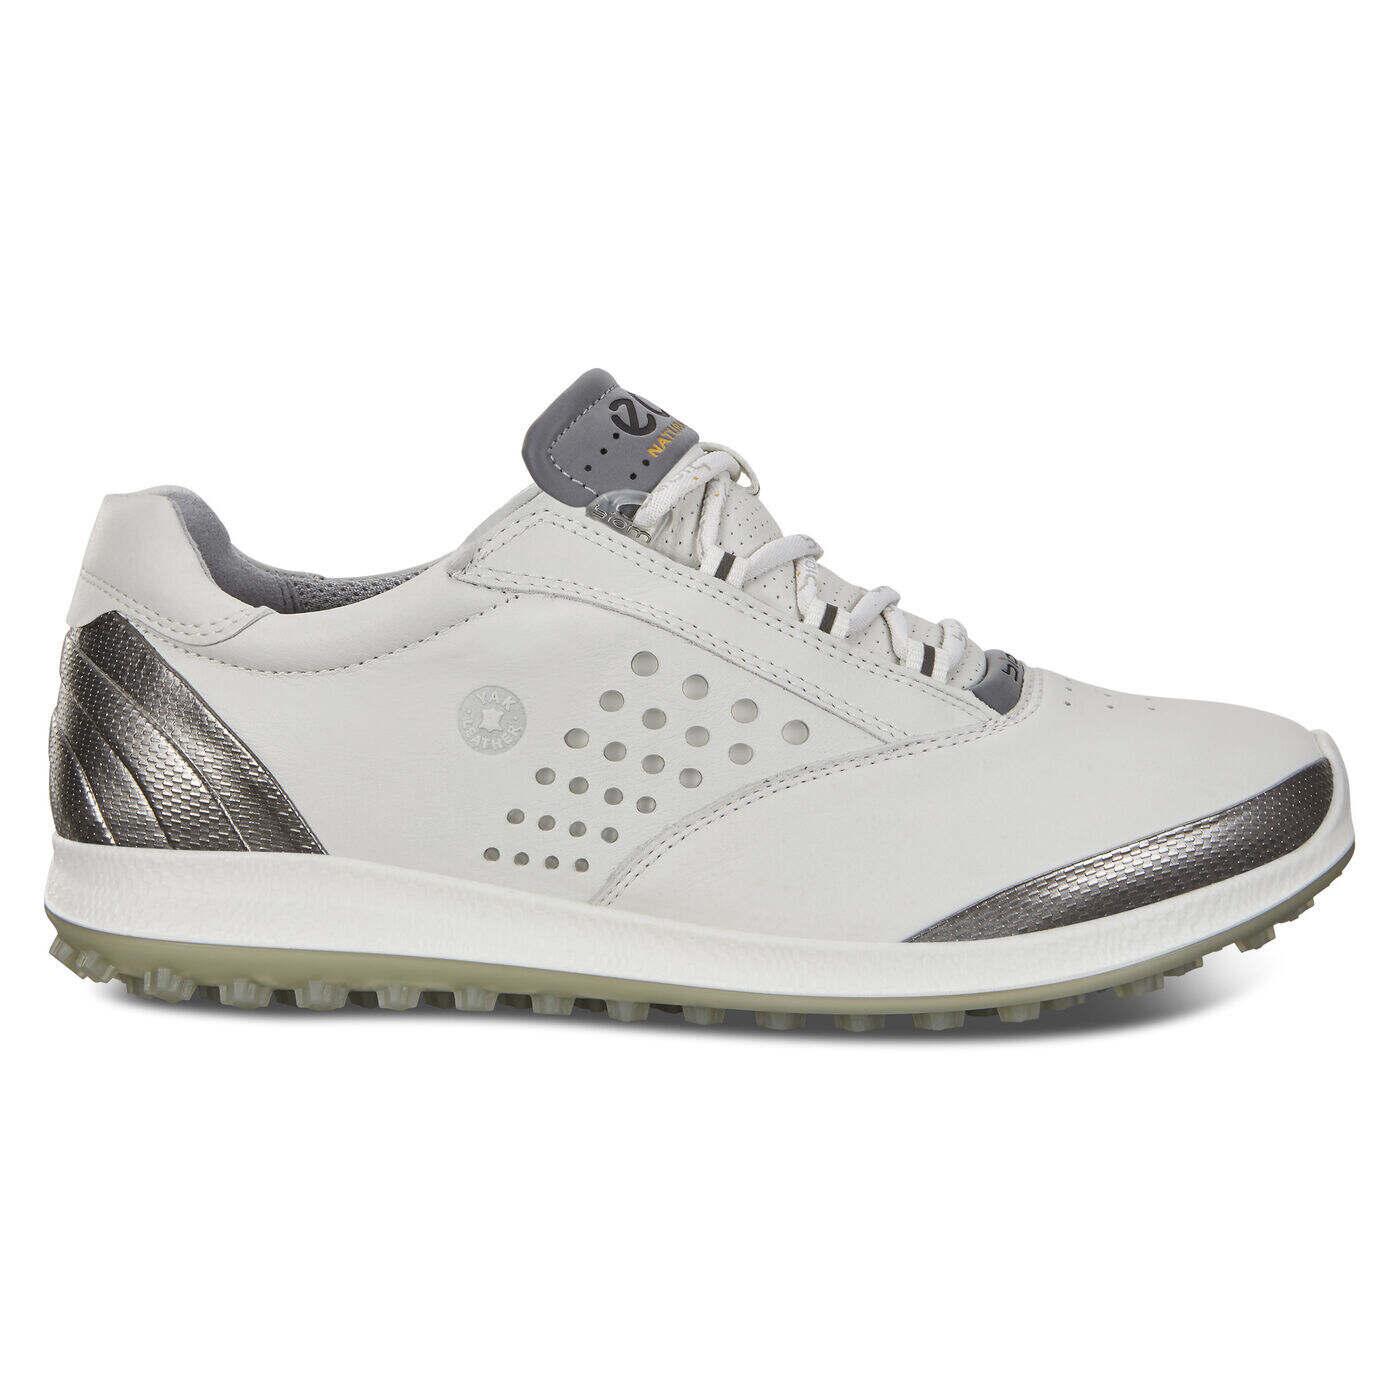 BIOM Hybrid 2 Women's Golf Shoe - White